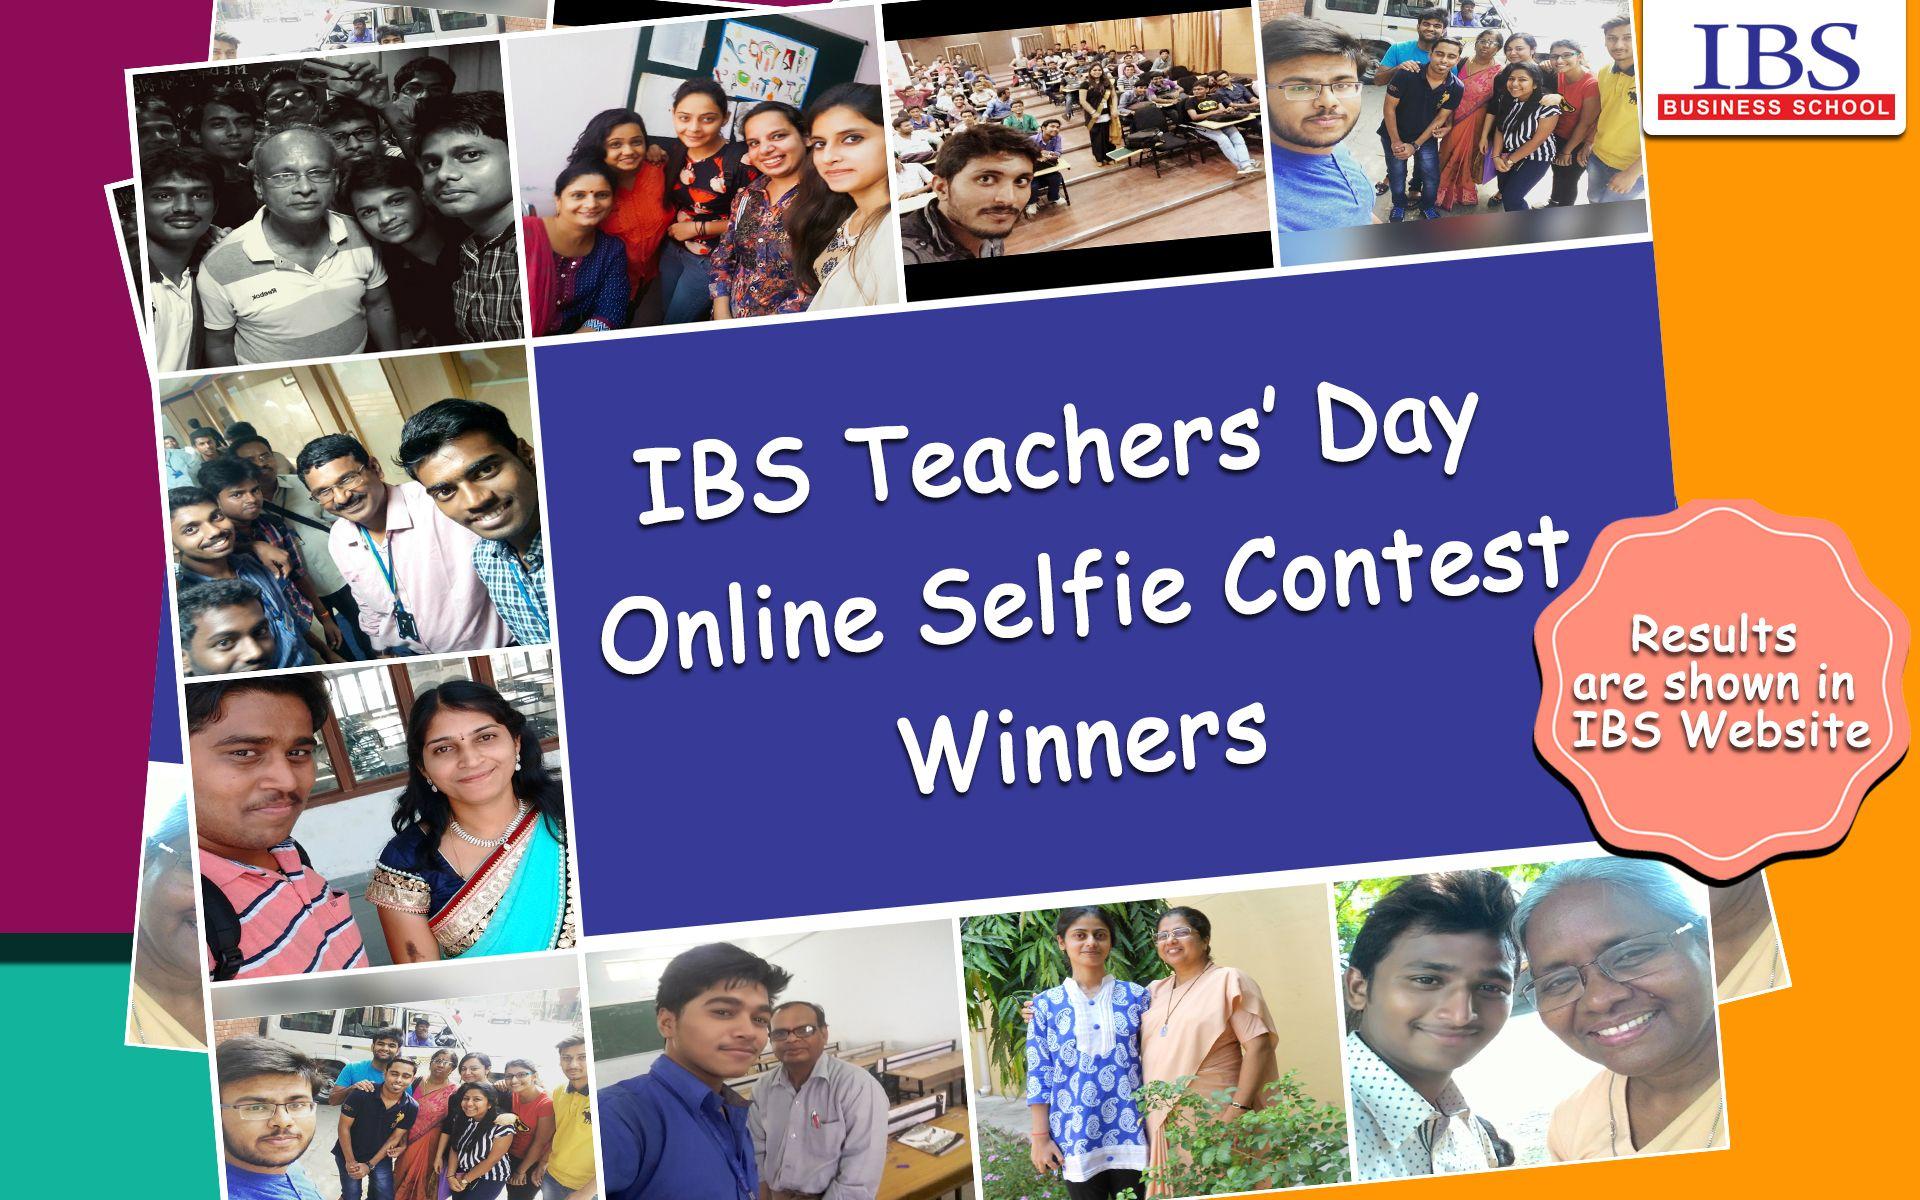 IBS Teachers' Day Selfie Contest Winners: http://ibsindia.org/selfieContest_winners/ #IBSAT2016